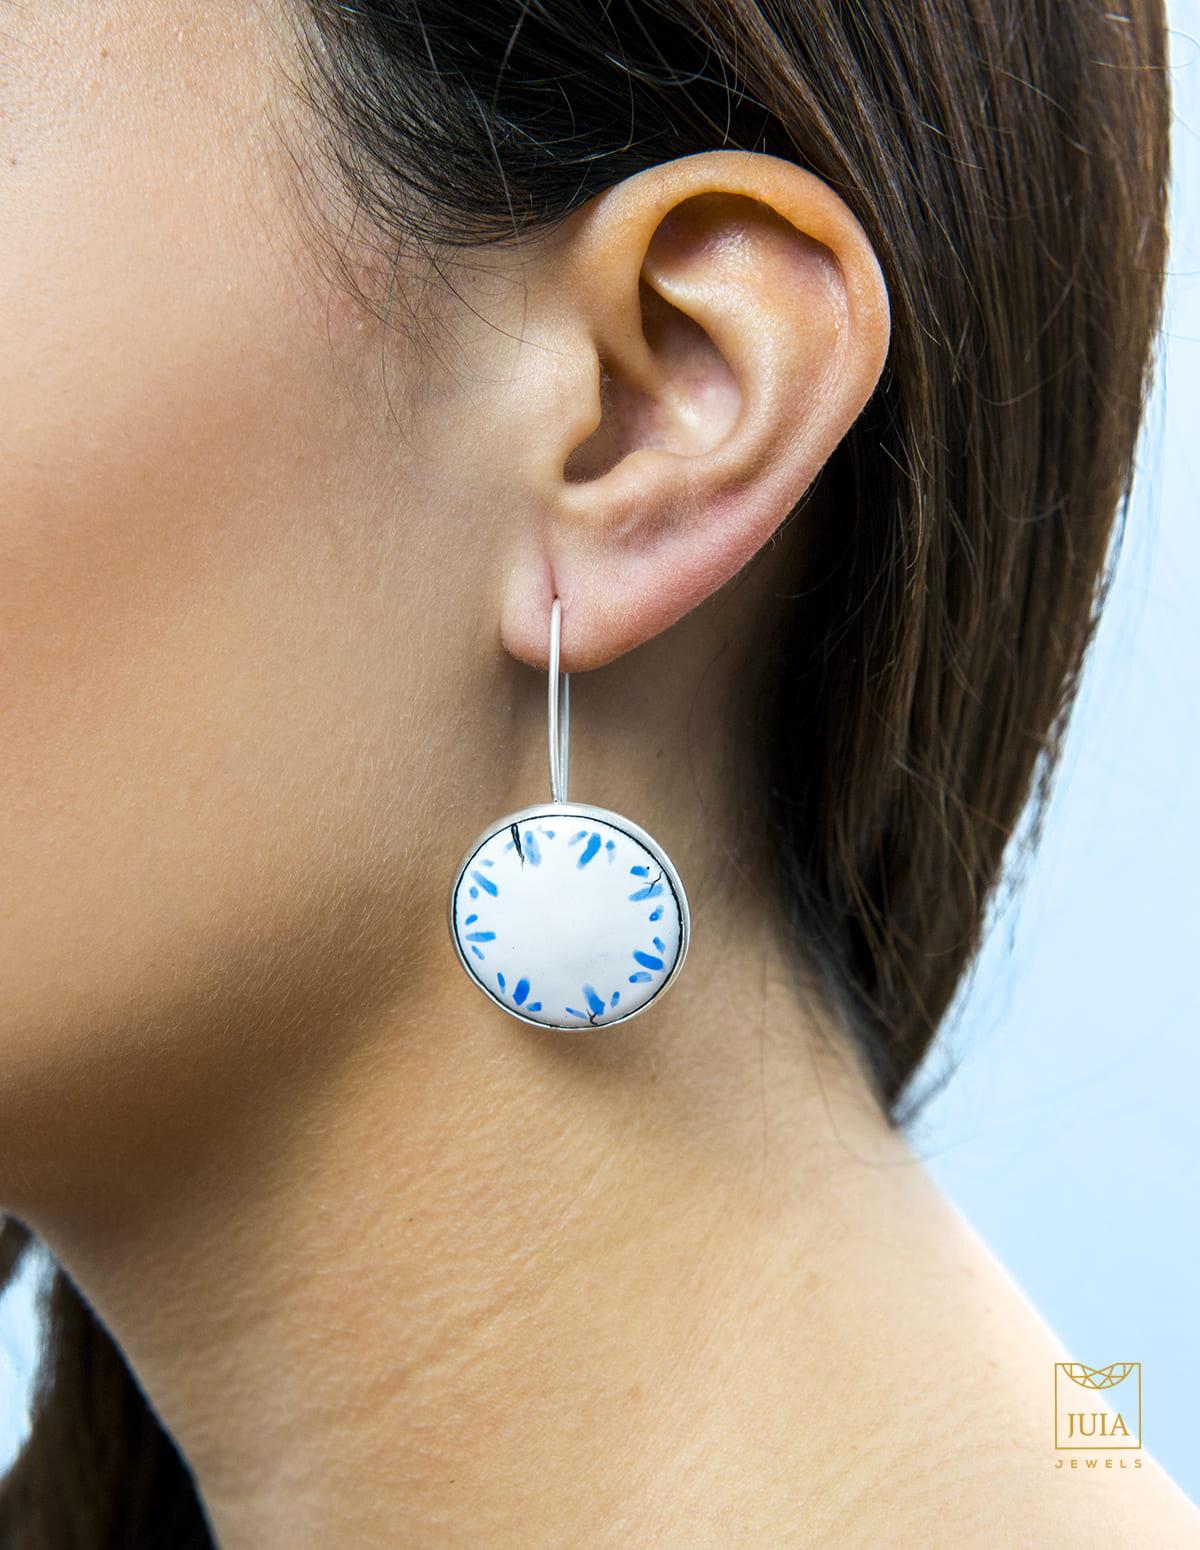 pendientes de plata para mujer, juia jewels barcelona, comprar pendientes de plata de diseño, joyeria etica, fairmined, joyasmarket